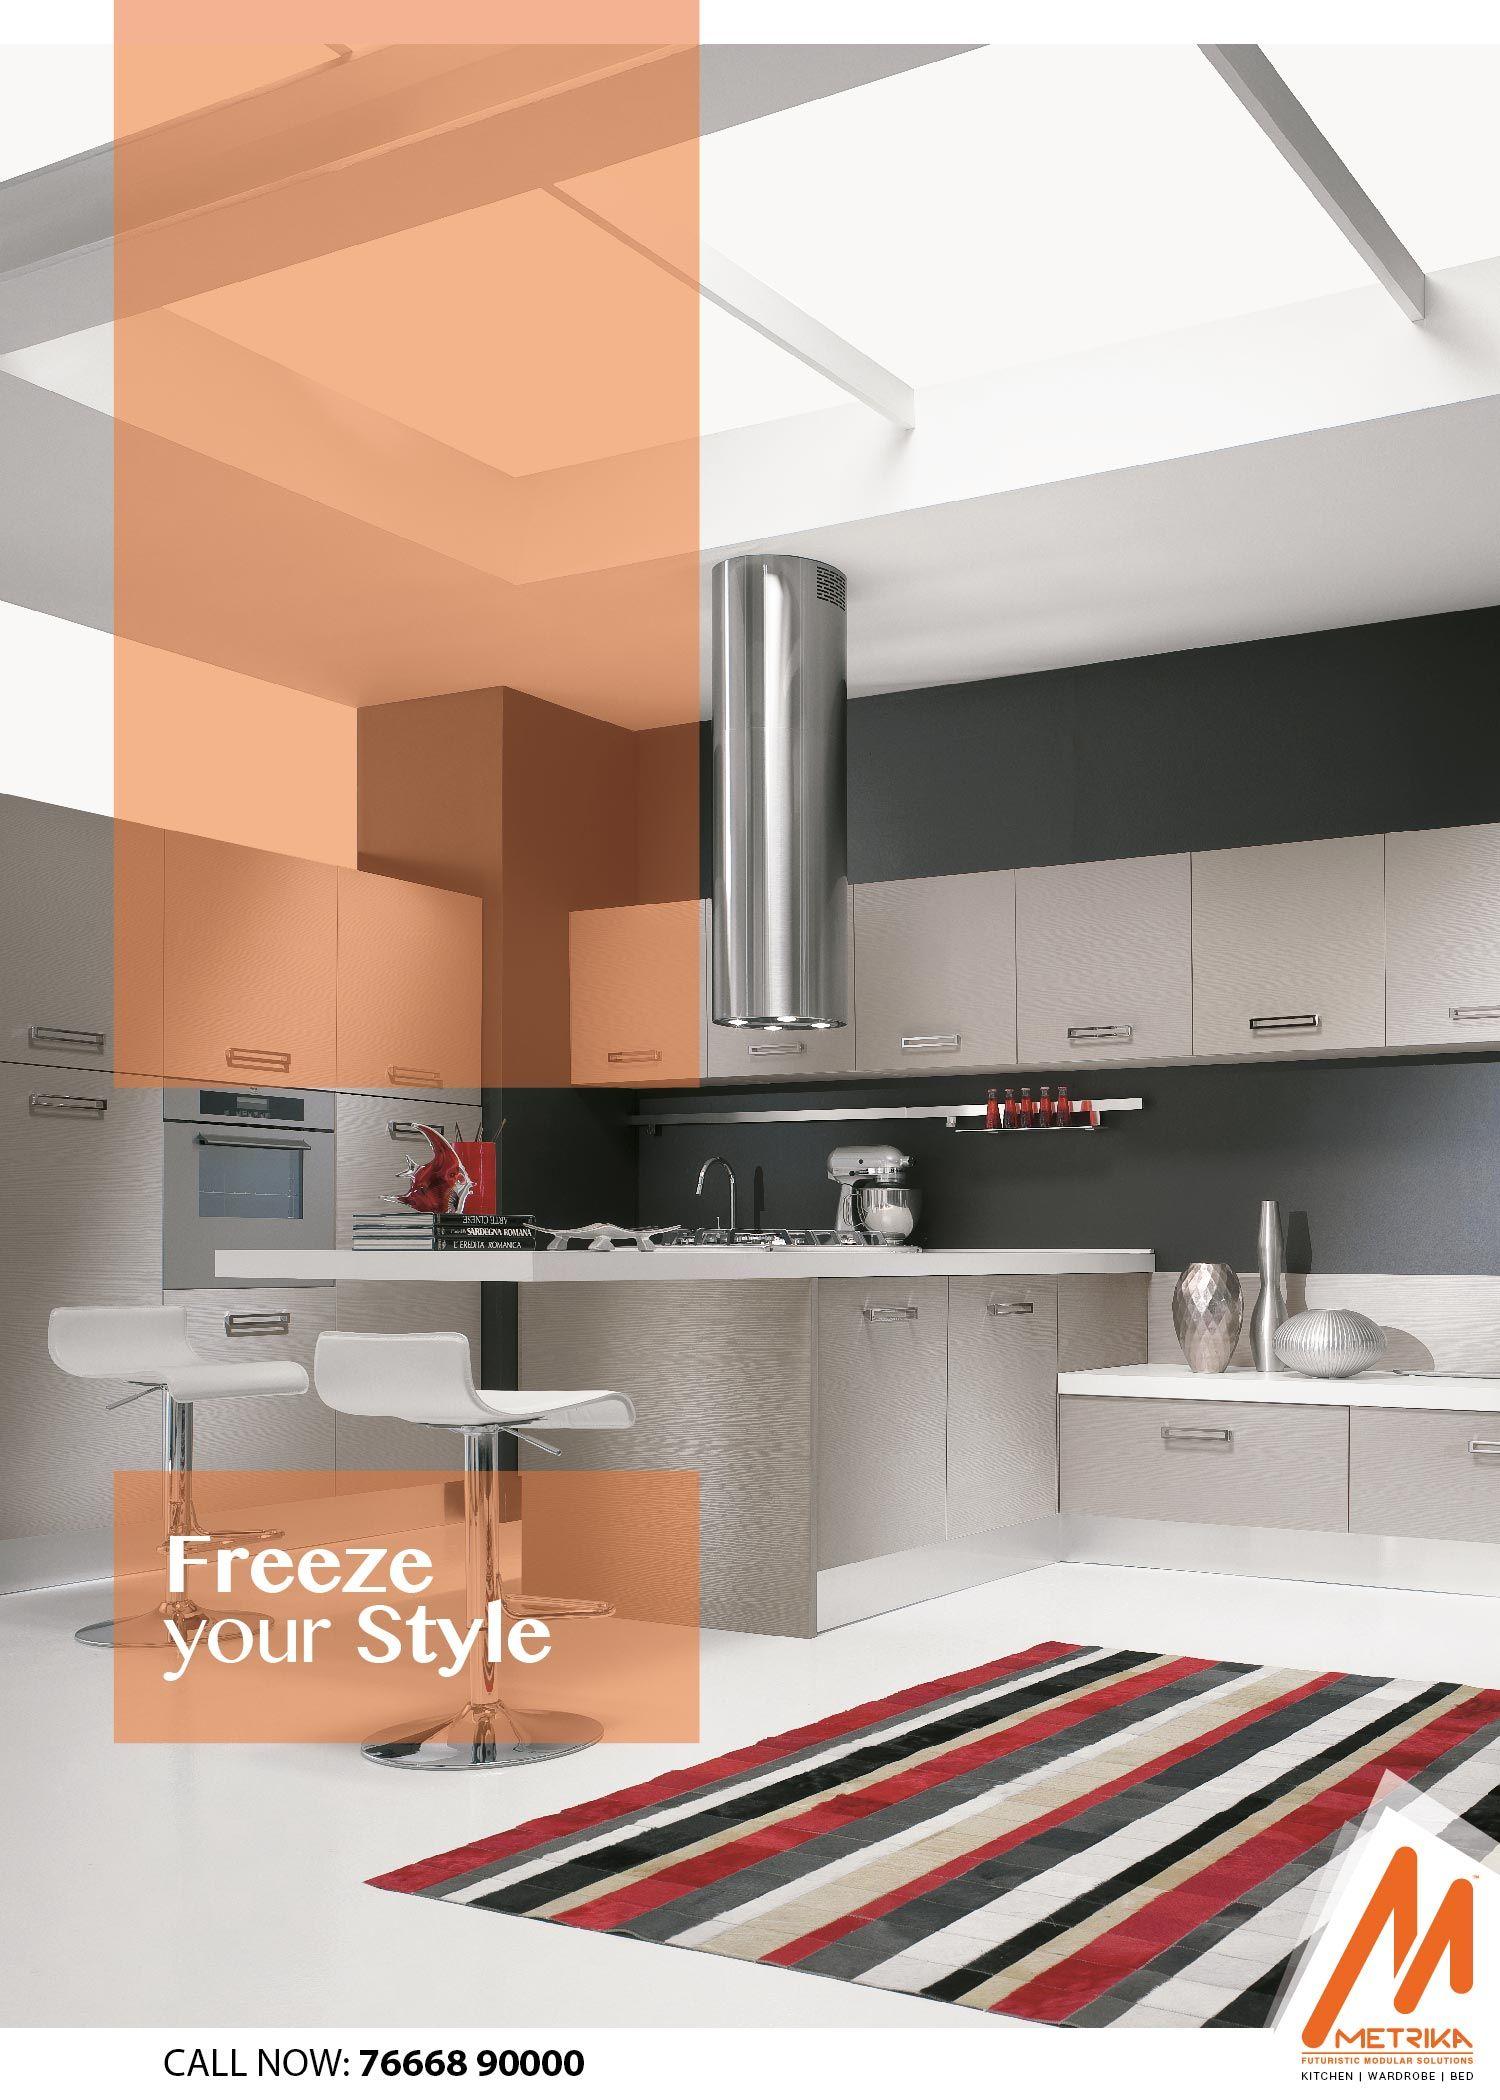 Freeze Your Style.👈 Now Metrika At Your Doorstep!! ➡ Book Your ...